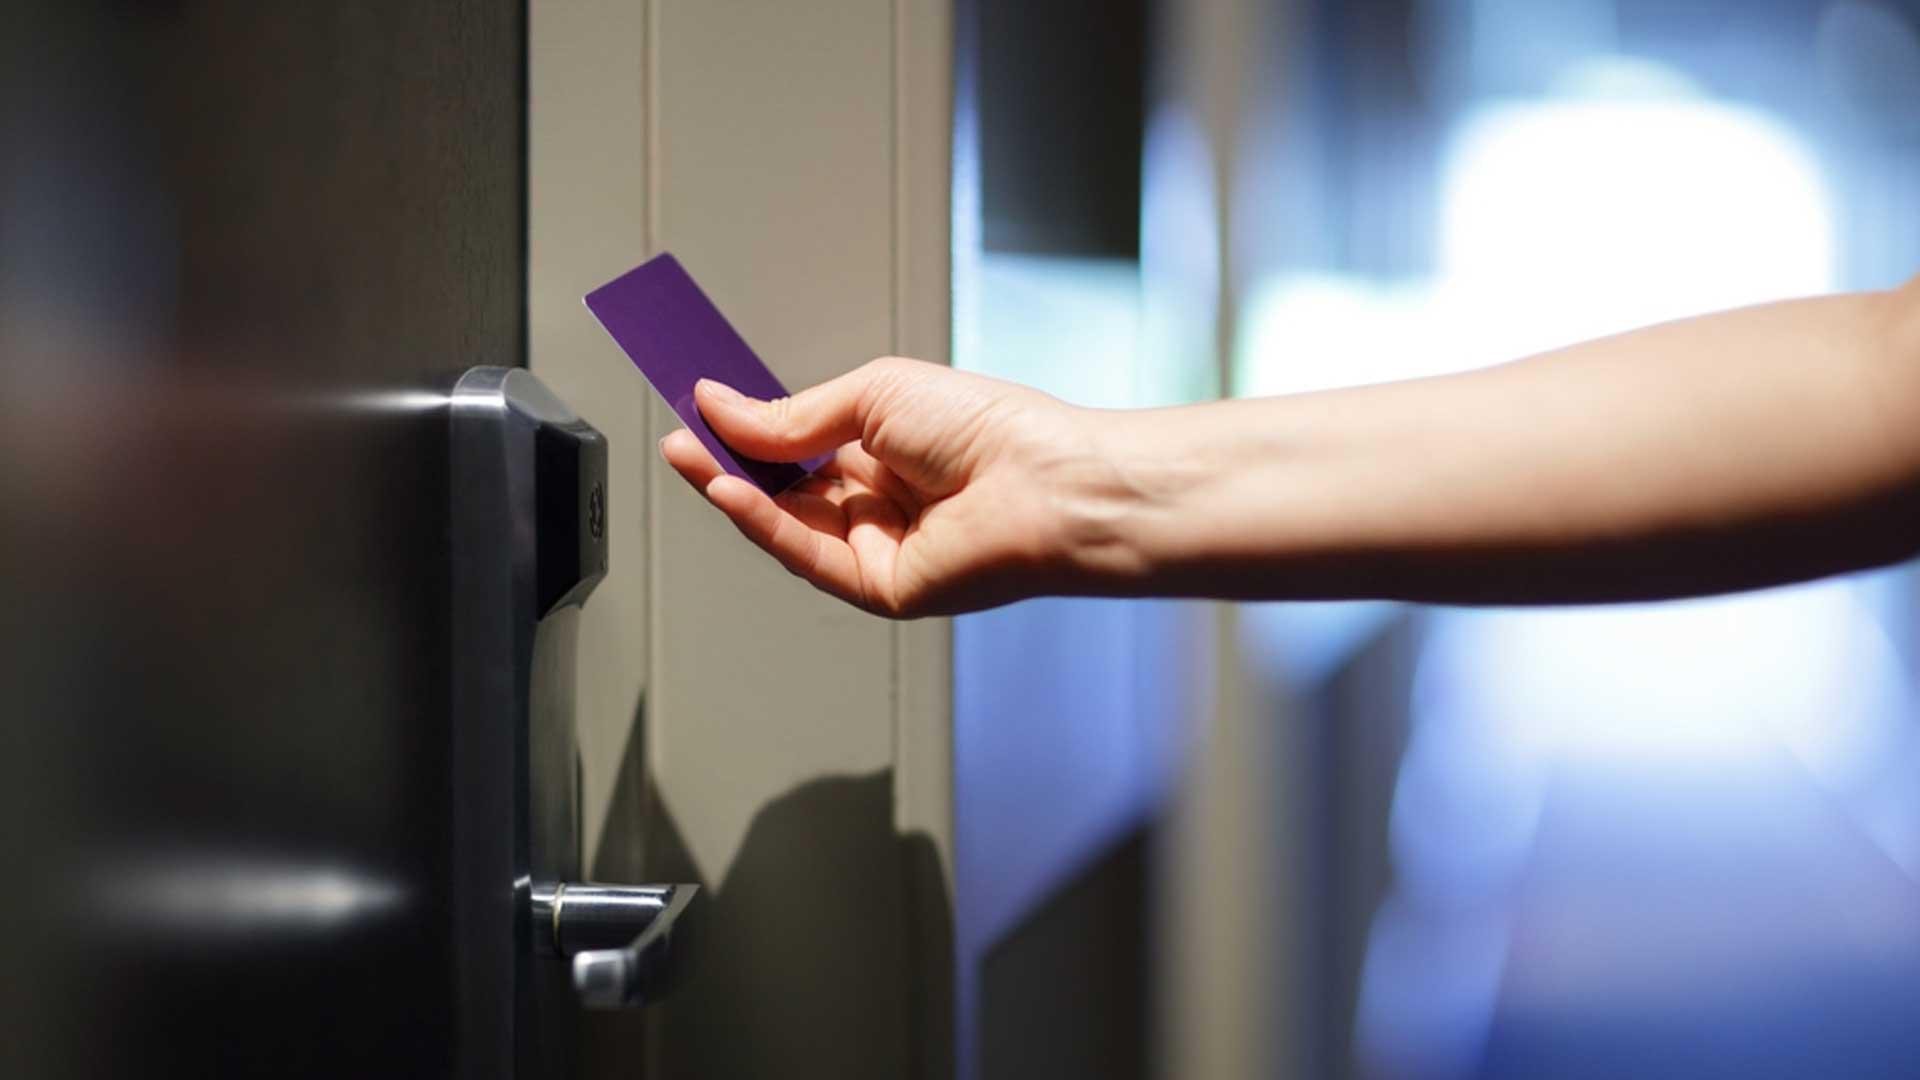 Tipe Pembaca Akses Kontrol untukKunci Pintu Elektronik